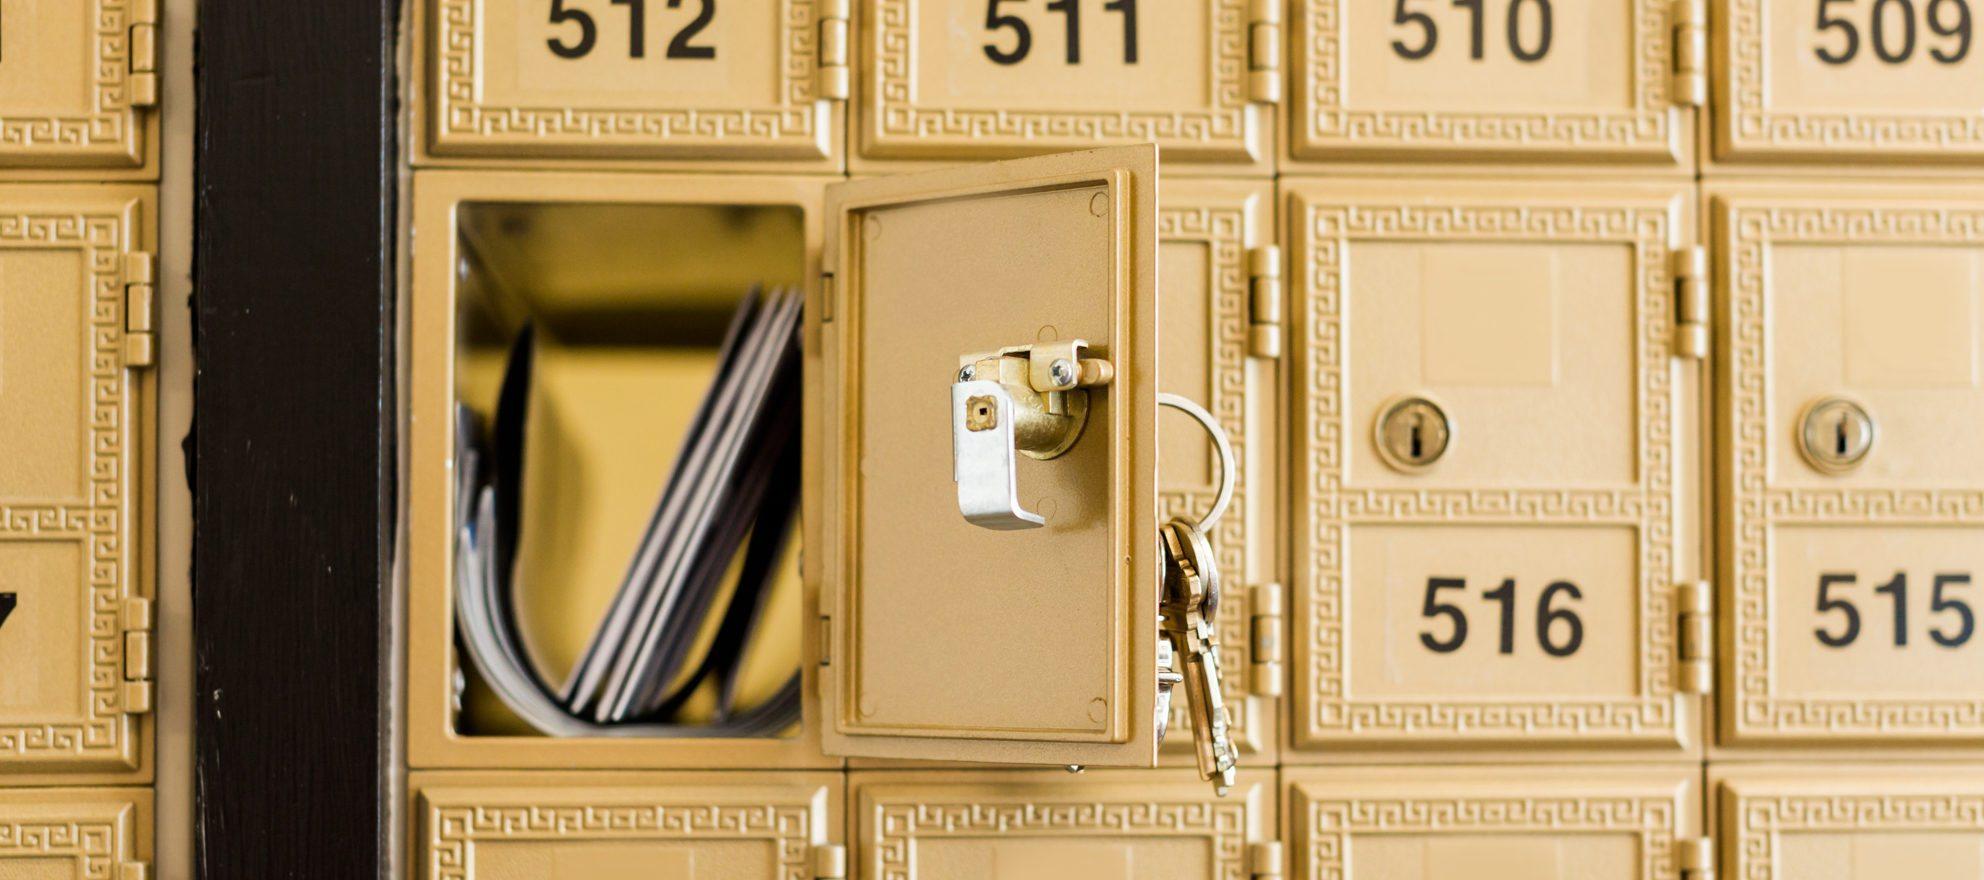 Letters from: real estate broker Lori Muller